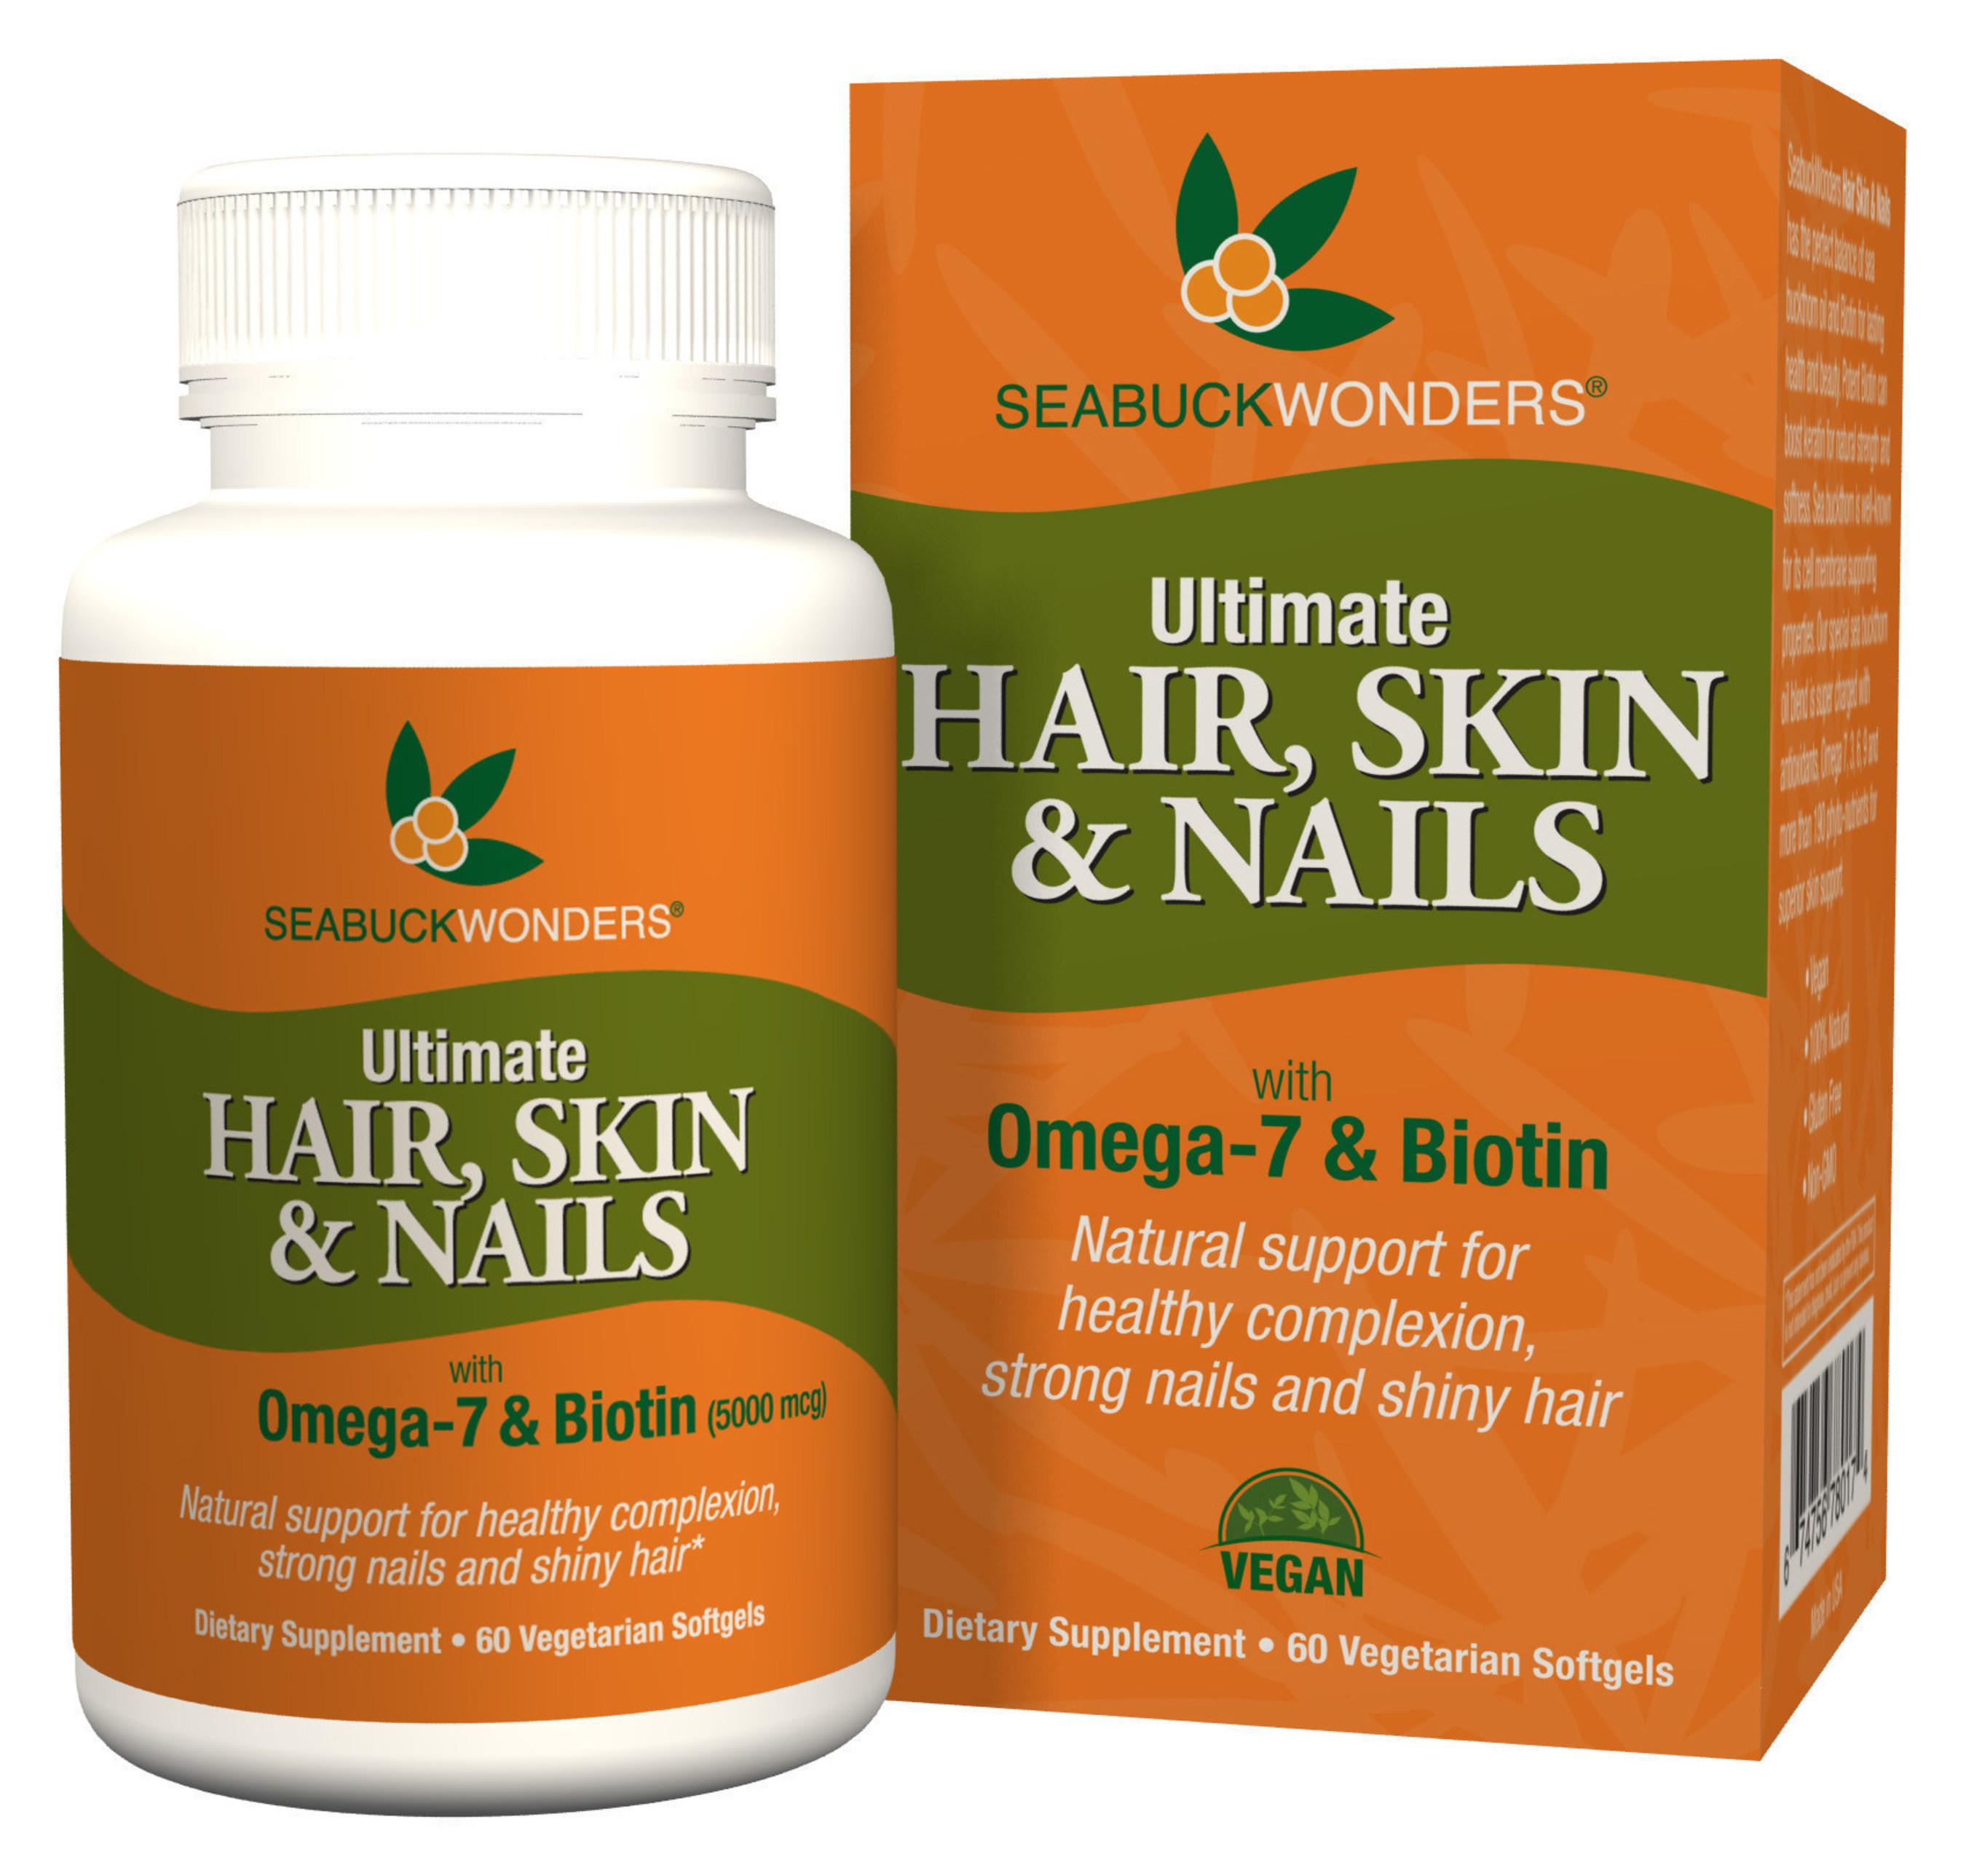 SeabuckWonders Ultimate Hair, Skin & Nails